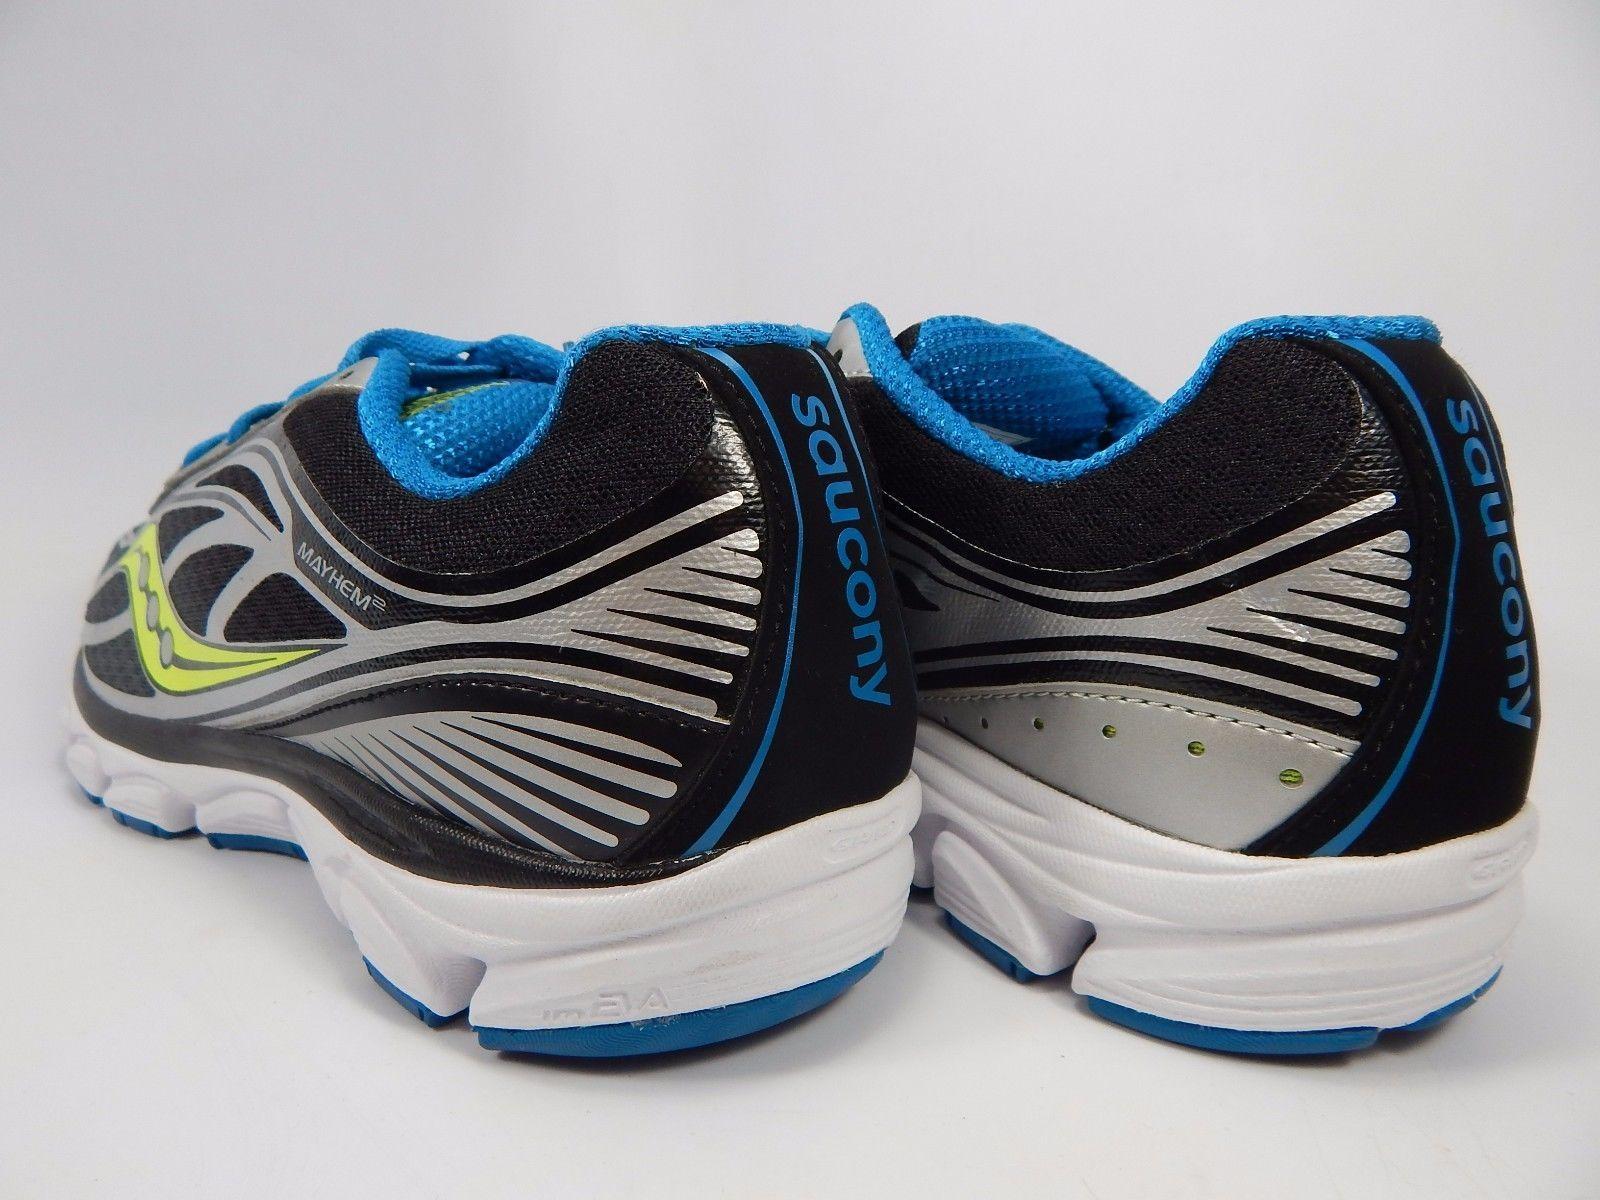 Saucony Mayhem 2 Men's Running Shoes Size US 9 M (D) EU 42.5 Gray Blue S25223-3